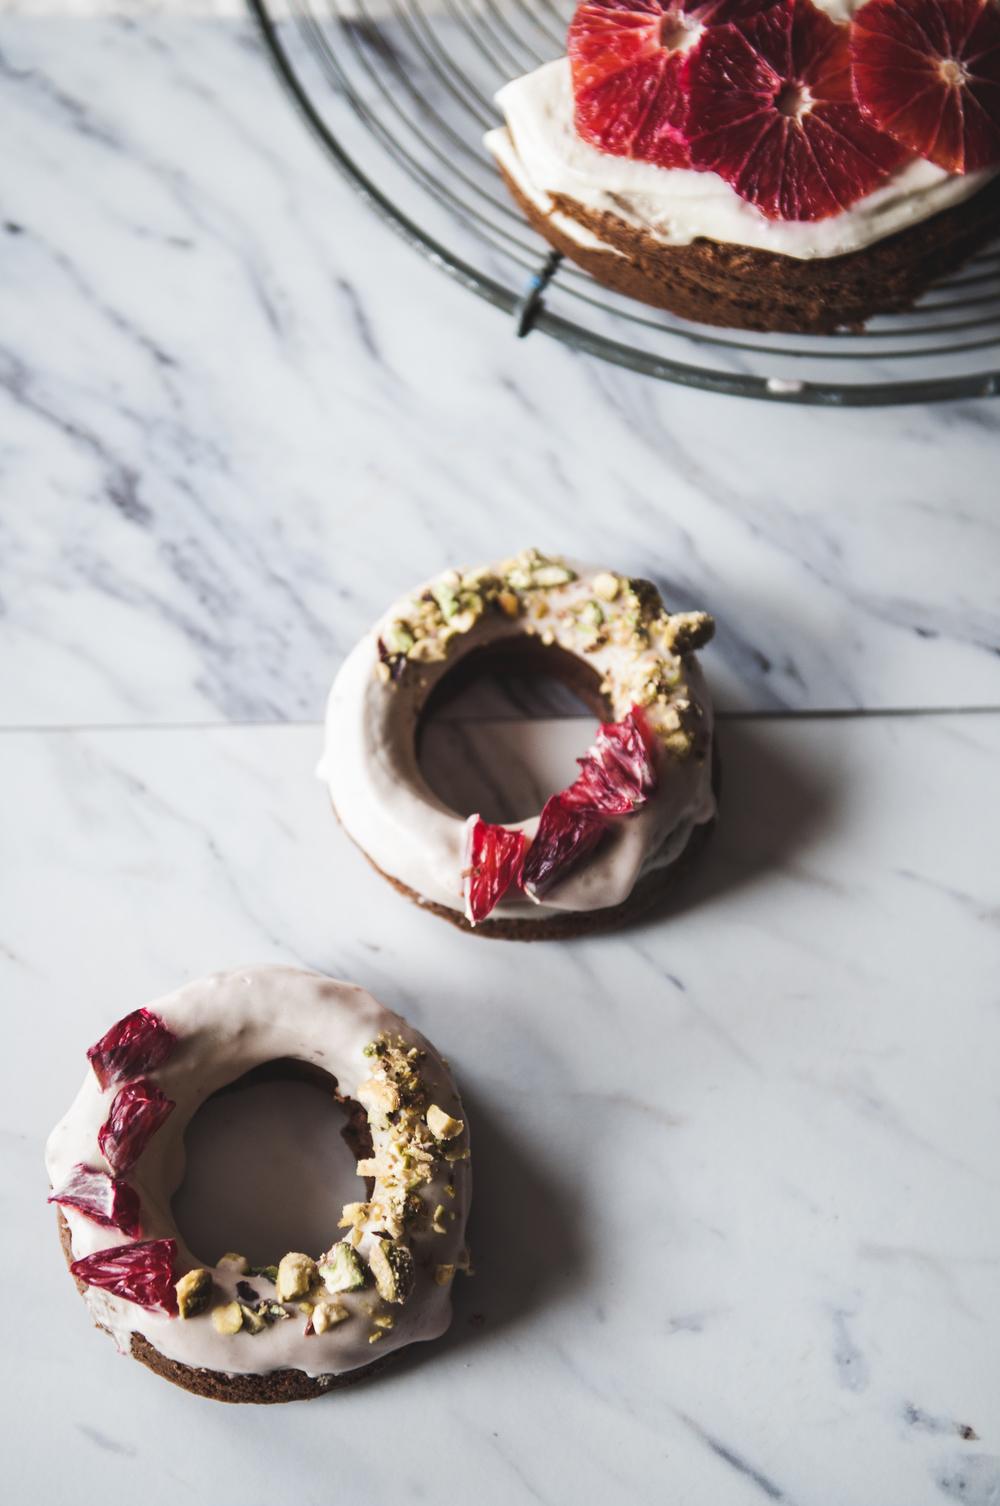 GLUTEN FREE CARROT CAKE DONUTS + BLOOD ORANGE FROSTING